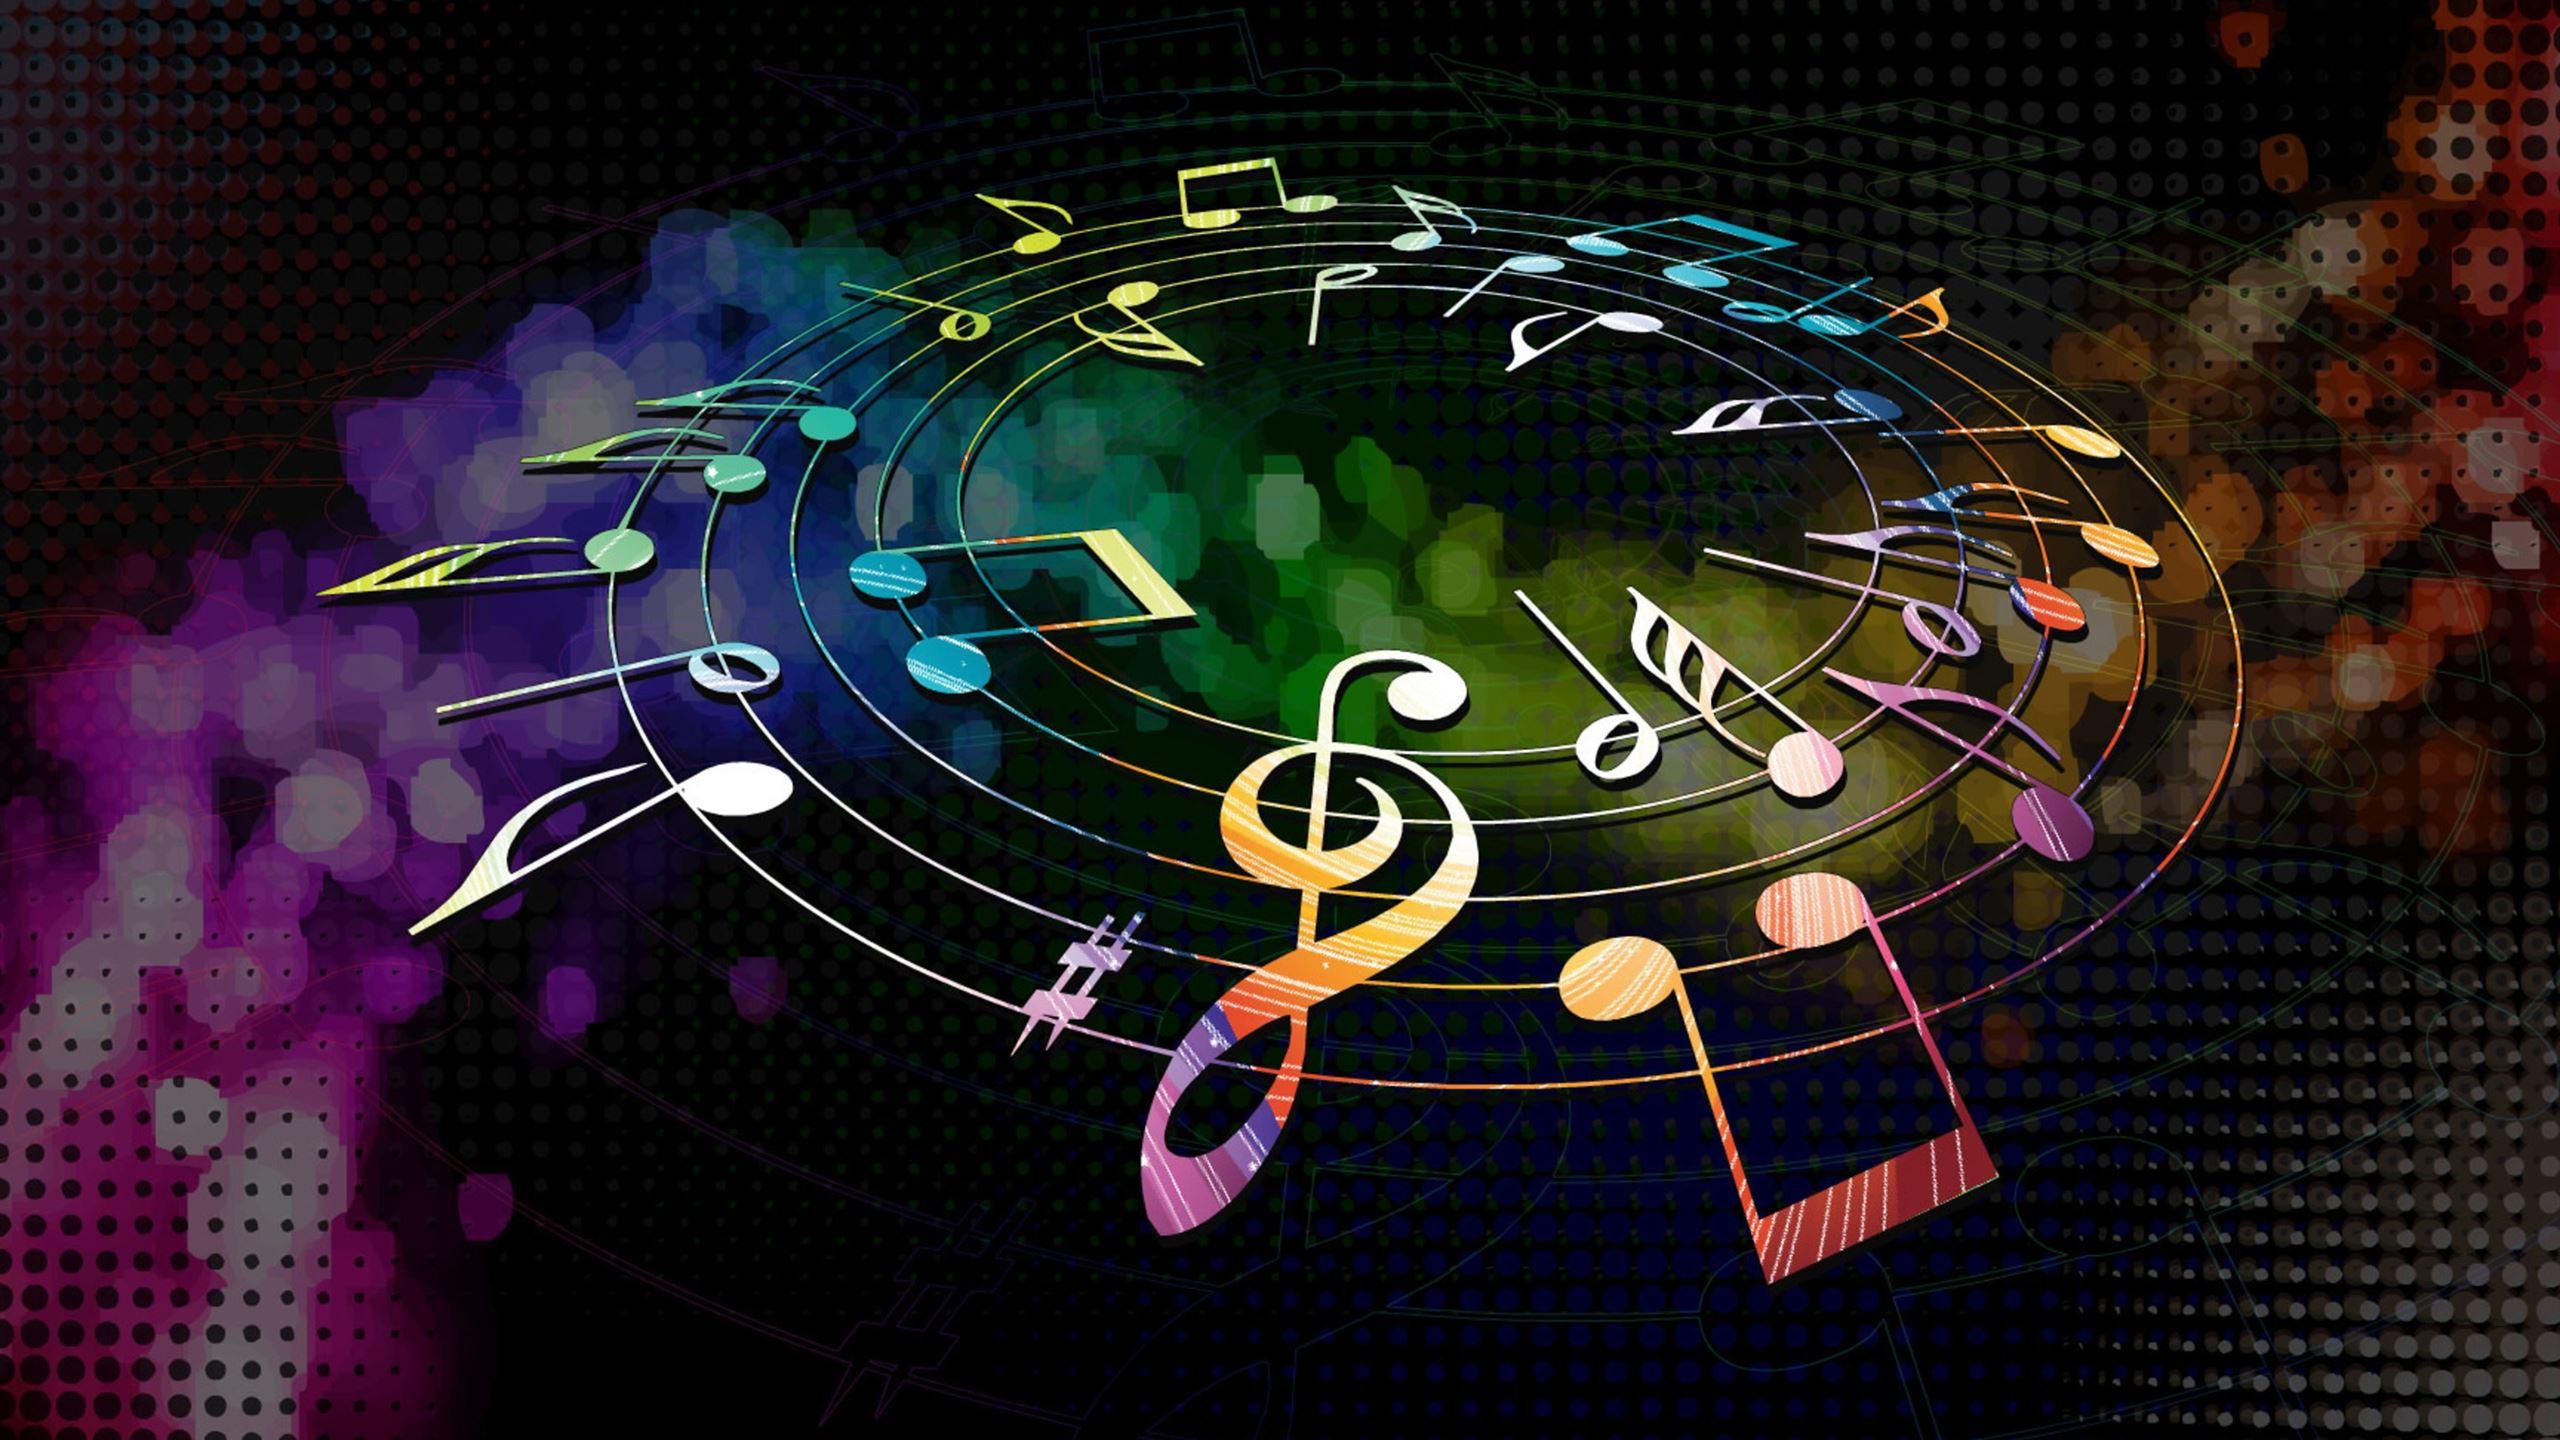 colorful musical notes mac wallpaper download free mac